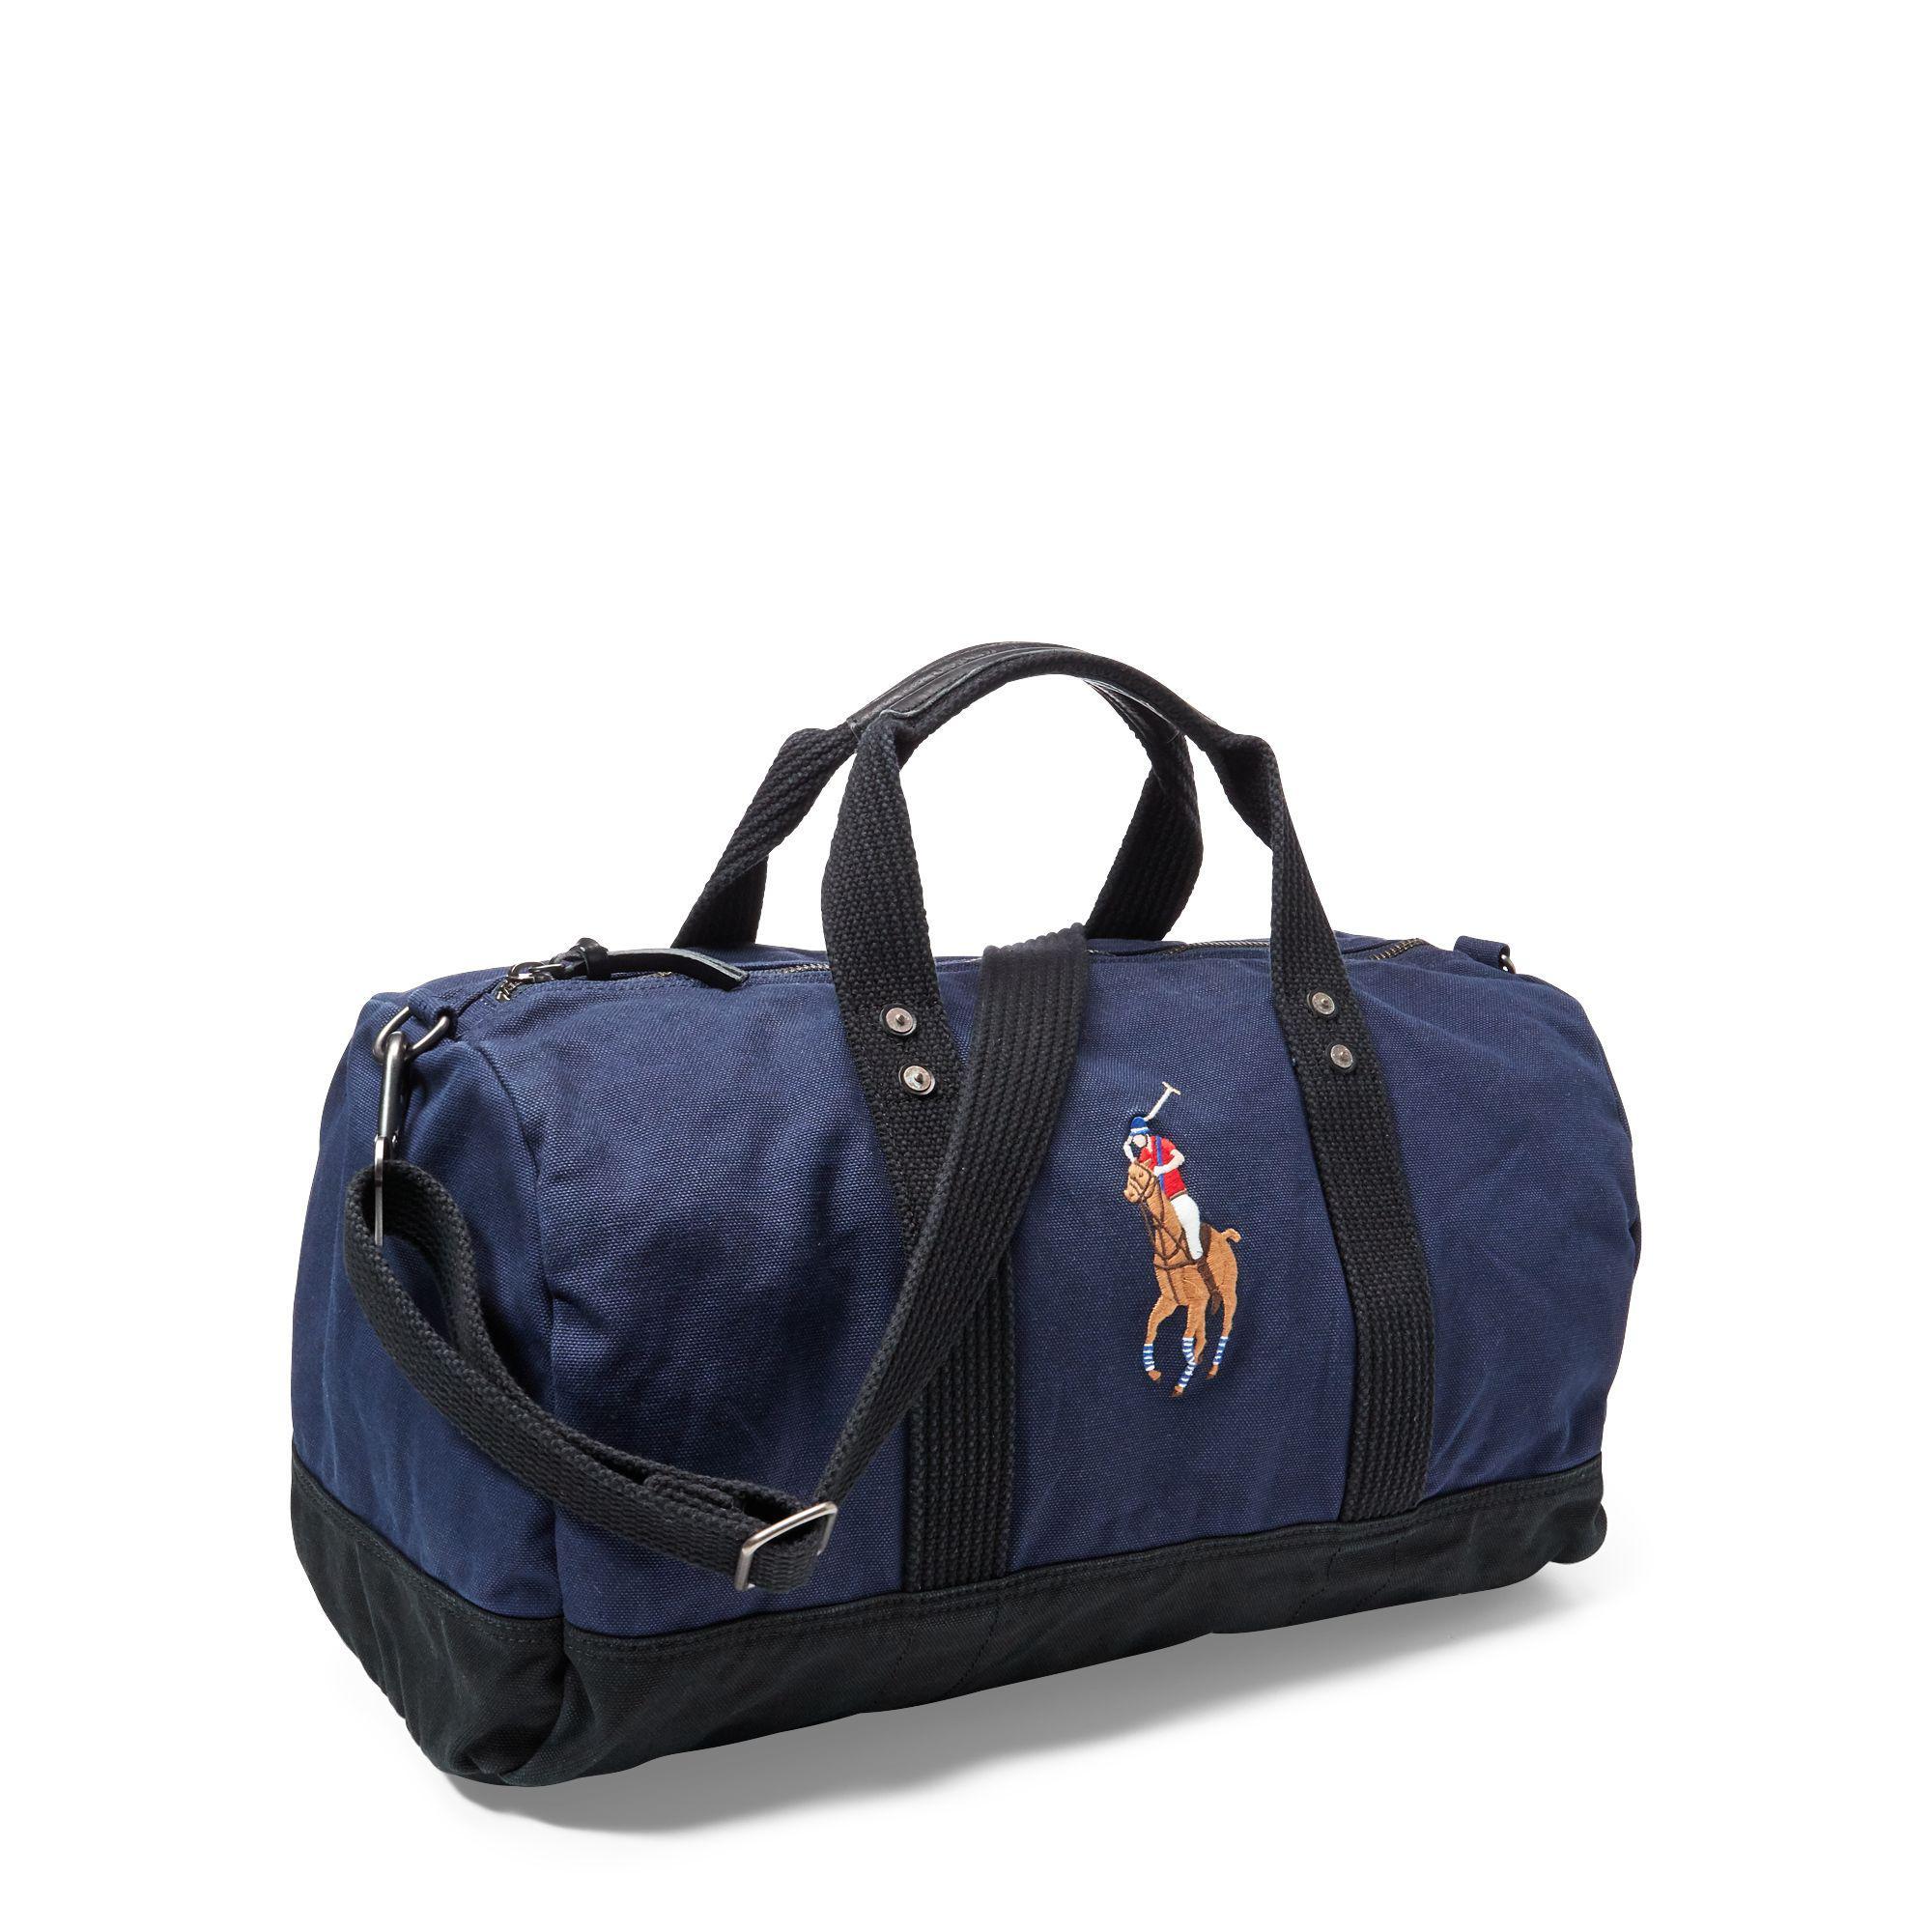 71494d507f ... shopping polo ralph lauren blue canvas big pony duffel bag for men  lyst. view fullscreen